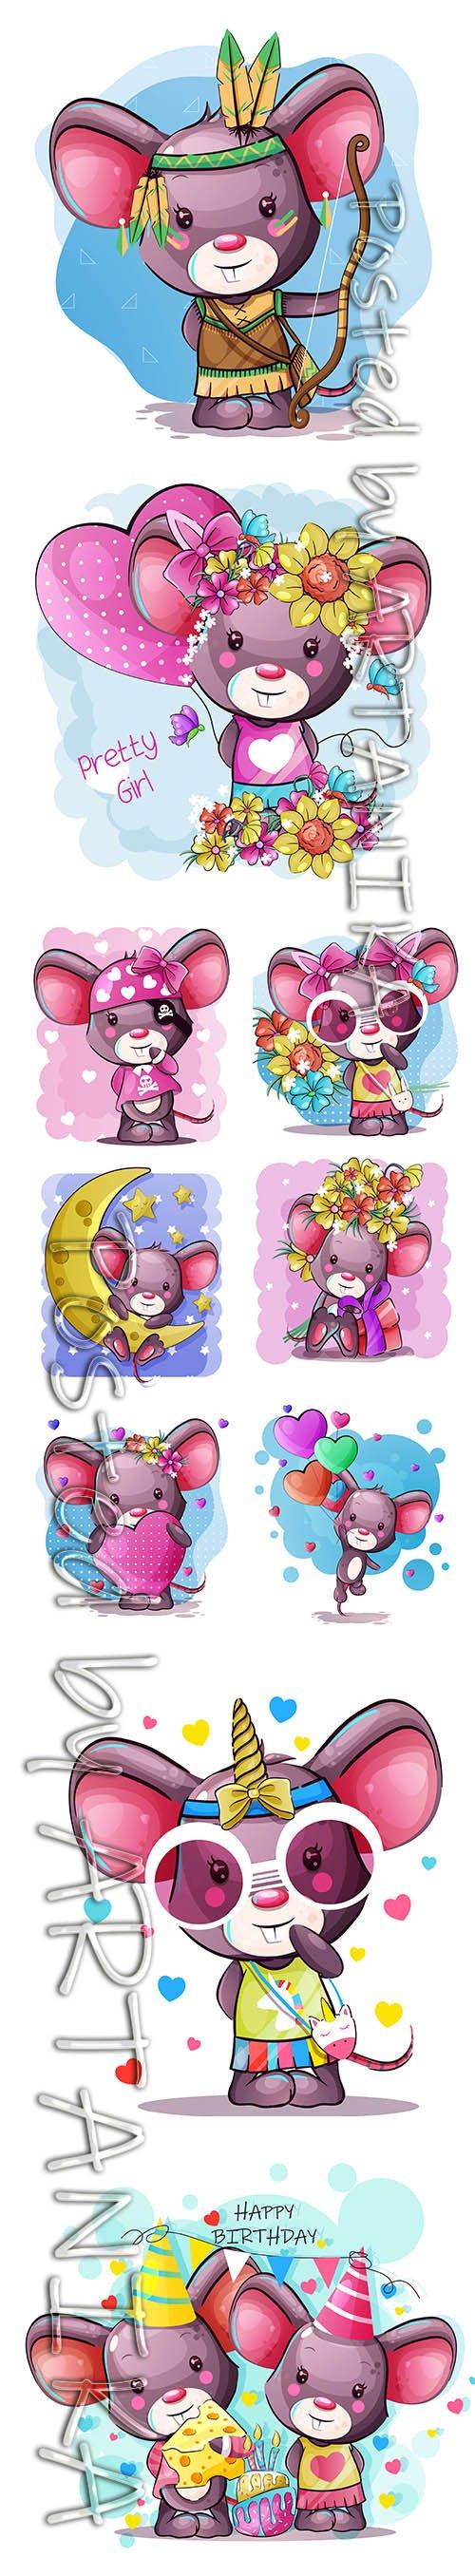 Cute Cartoon Mouse Hand-Draw Illustrations Set Vol 2